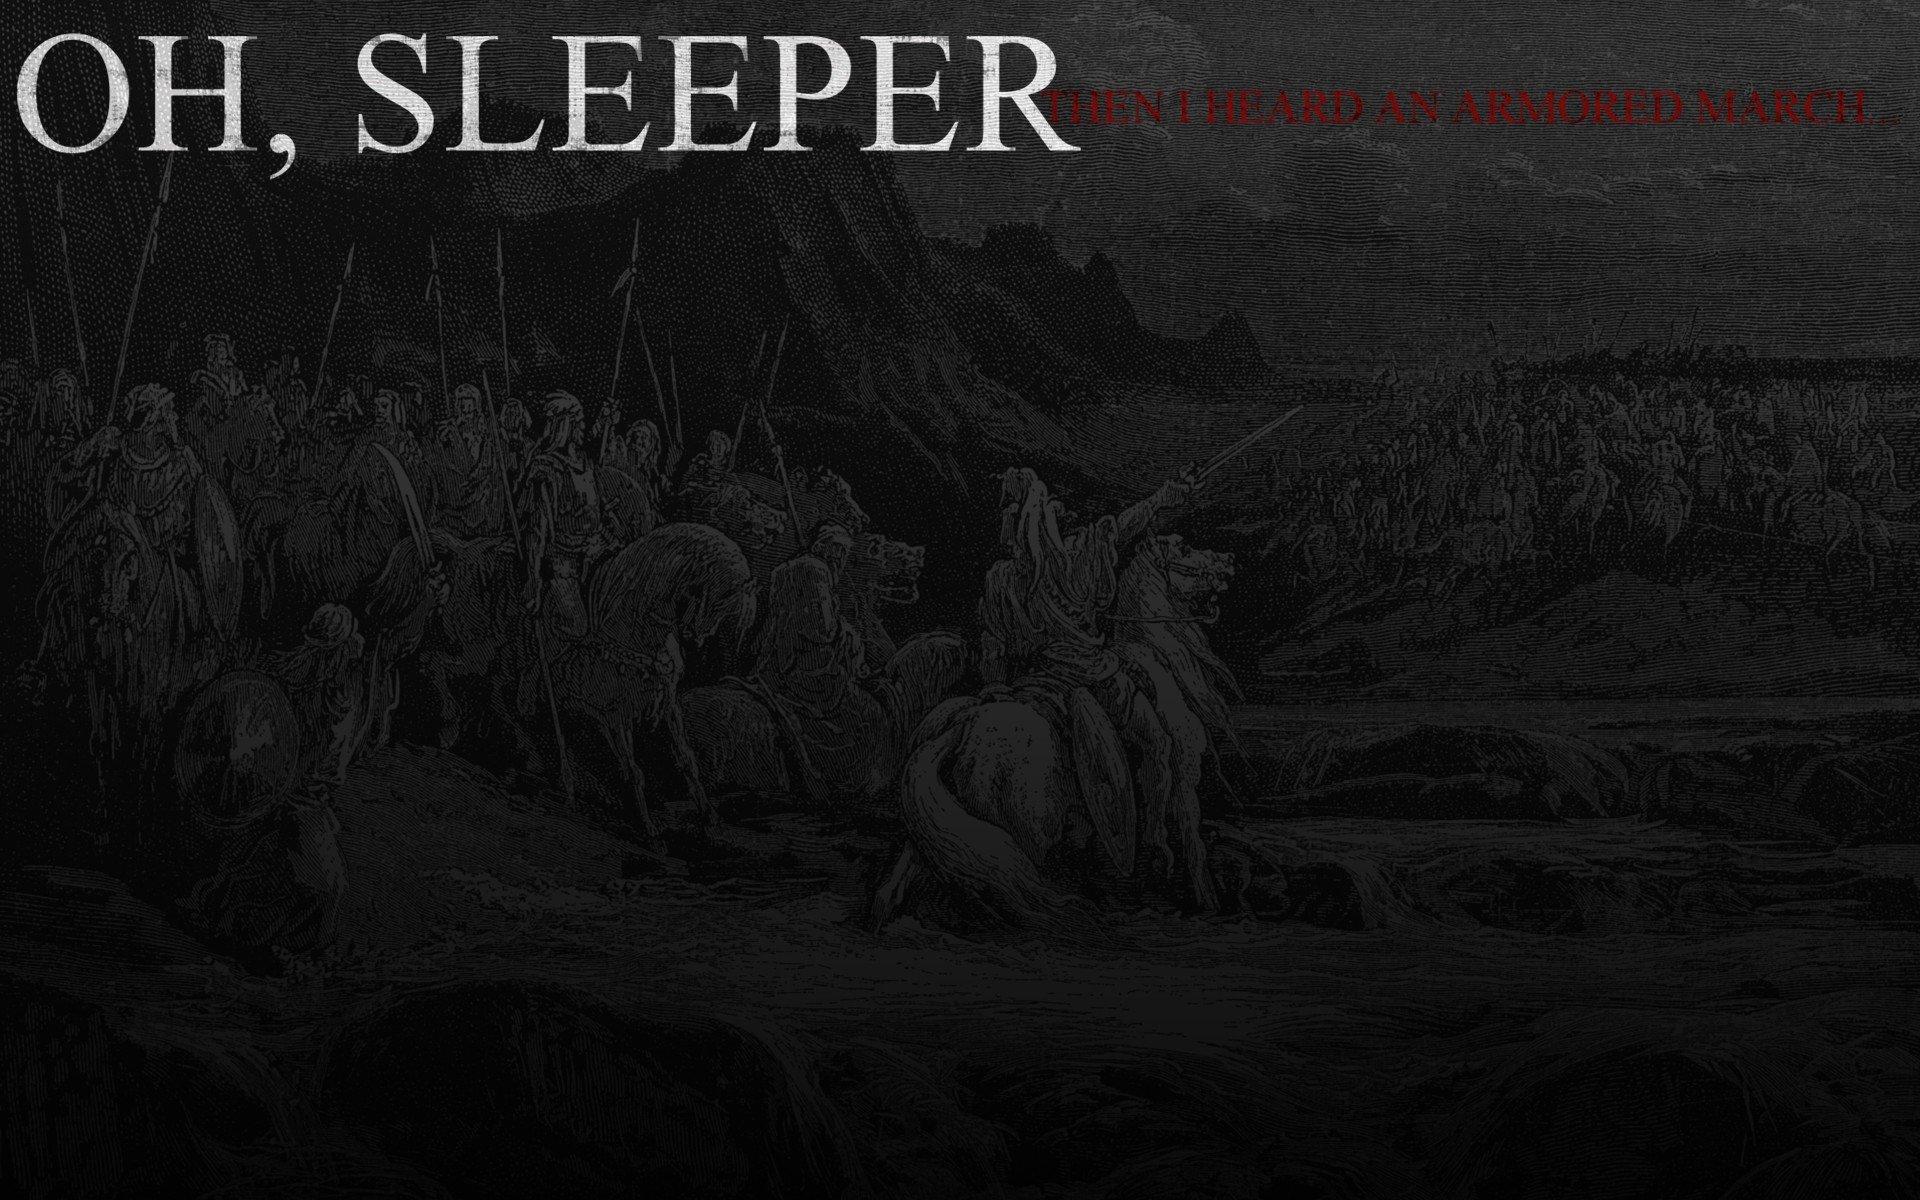 Musica - Oh Sleeper  Musica Sfondo